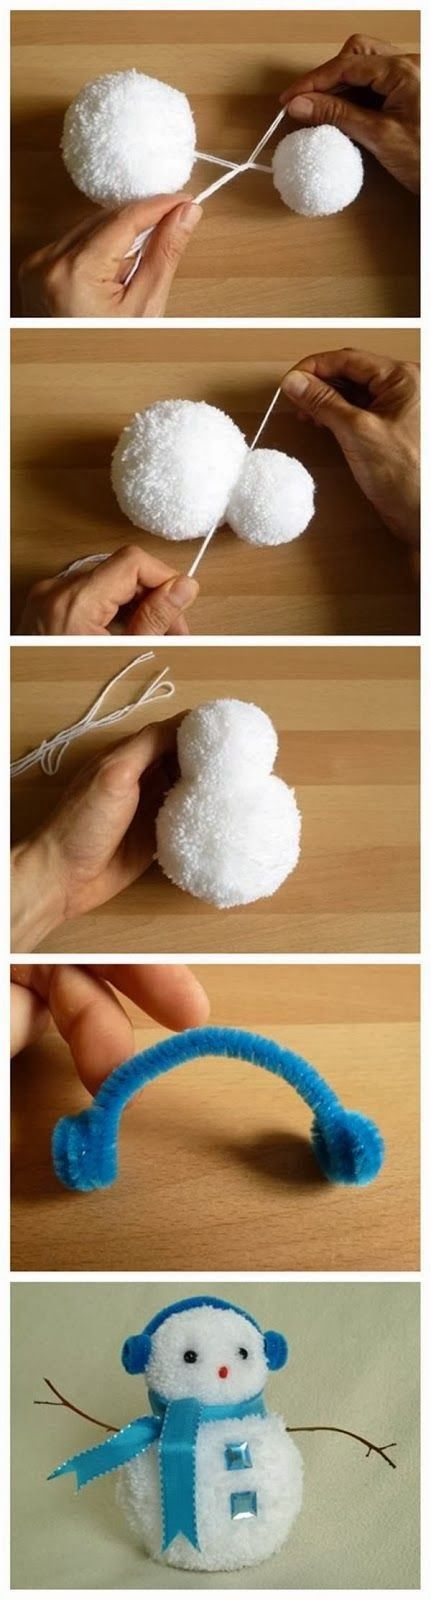 Bonhomme de neige .:                                                                                                                                                                                 Plus